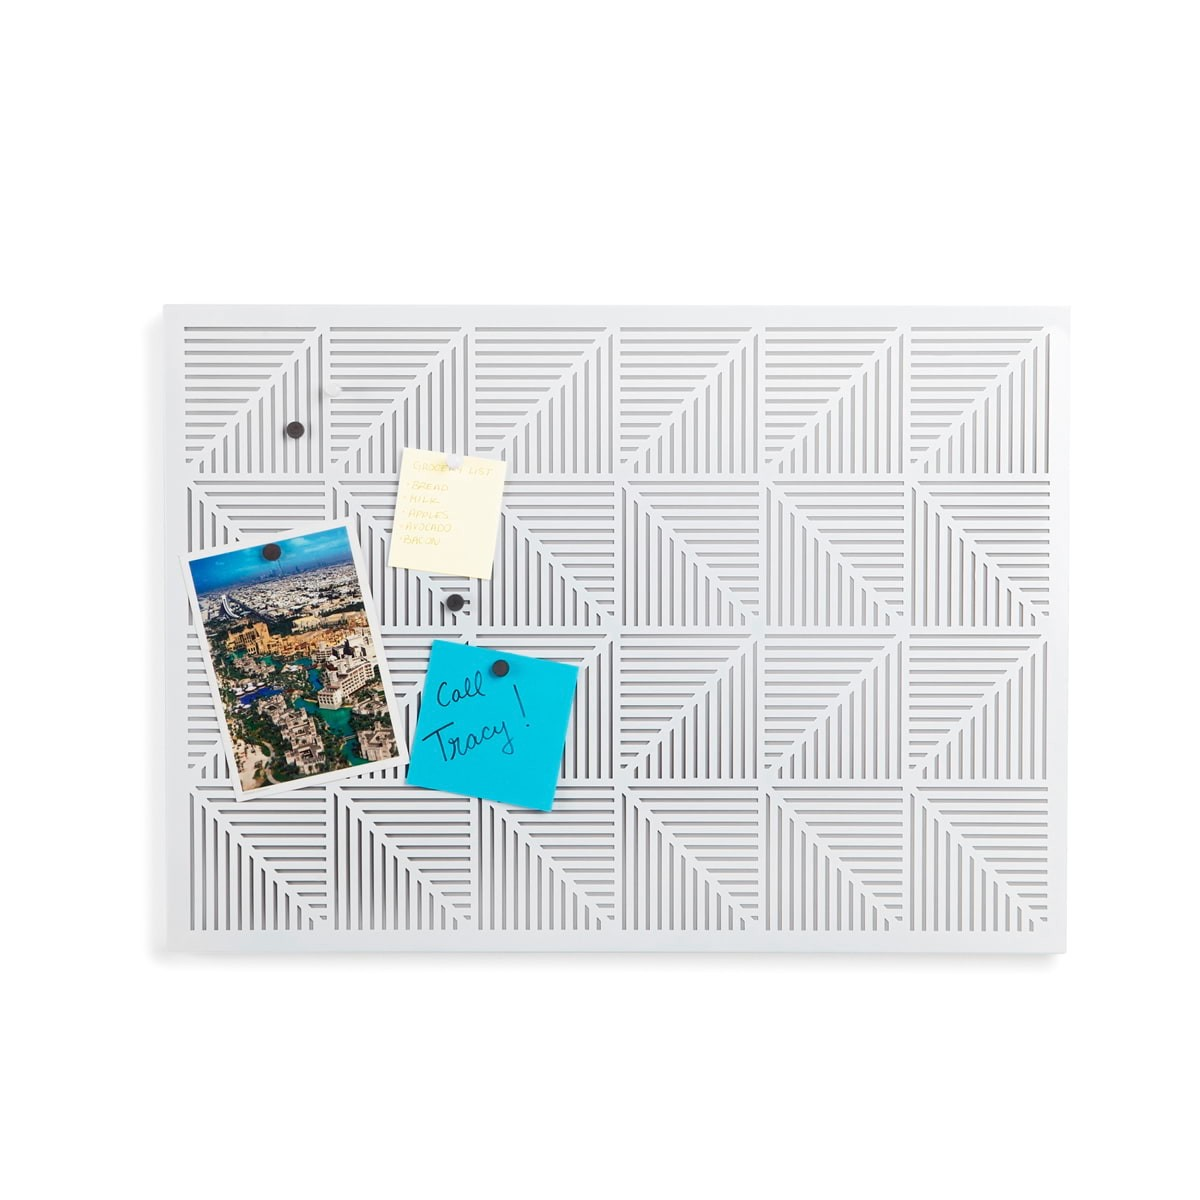 Umbra Trigon Bulletin Board (White) | Design Is This